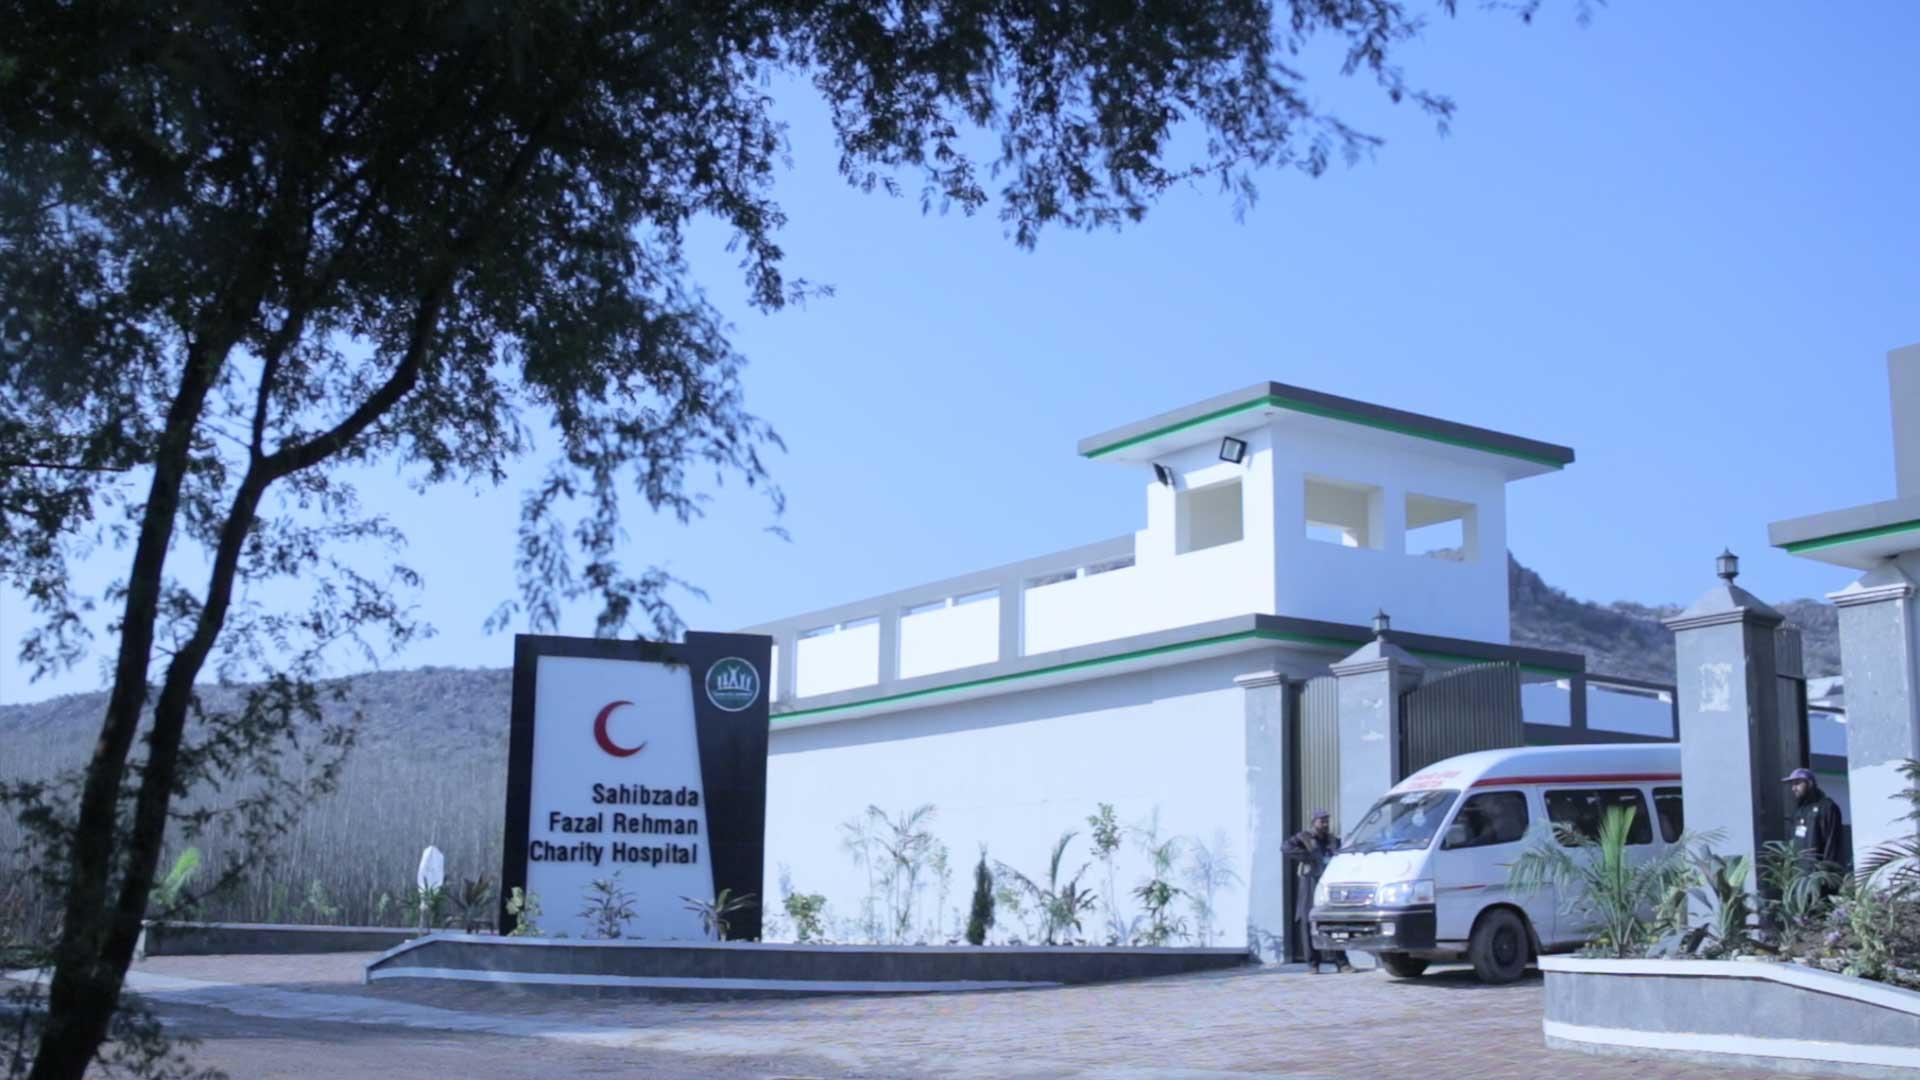 SahibzadaFazal RehmanCharity Hospital